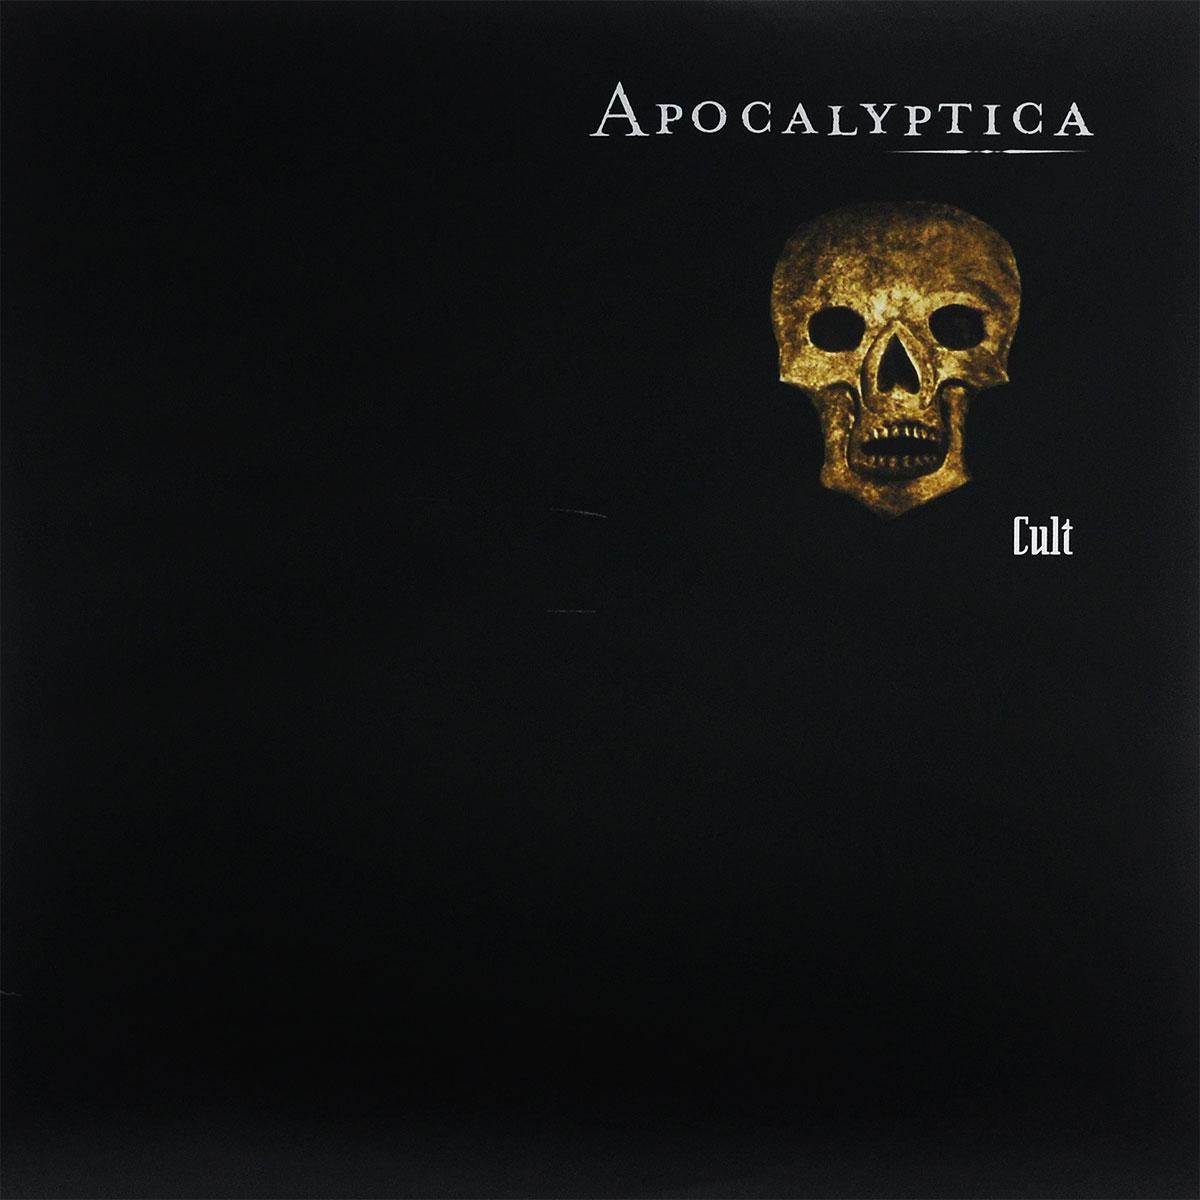 Apocalyptica Apocalyptica. Cult (2 LP + CD) apocalyptica apocalyptica shadowmaker 2 lp cd